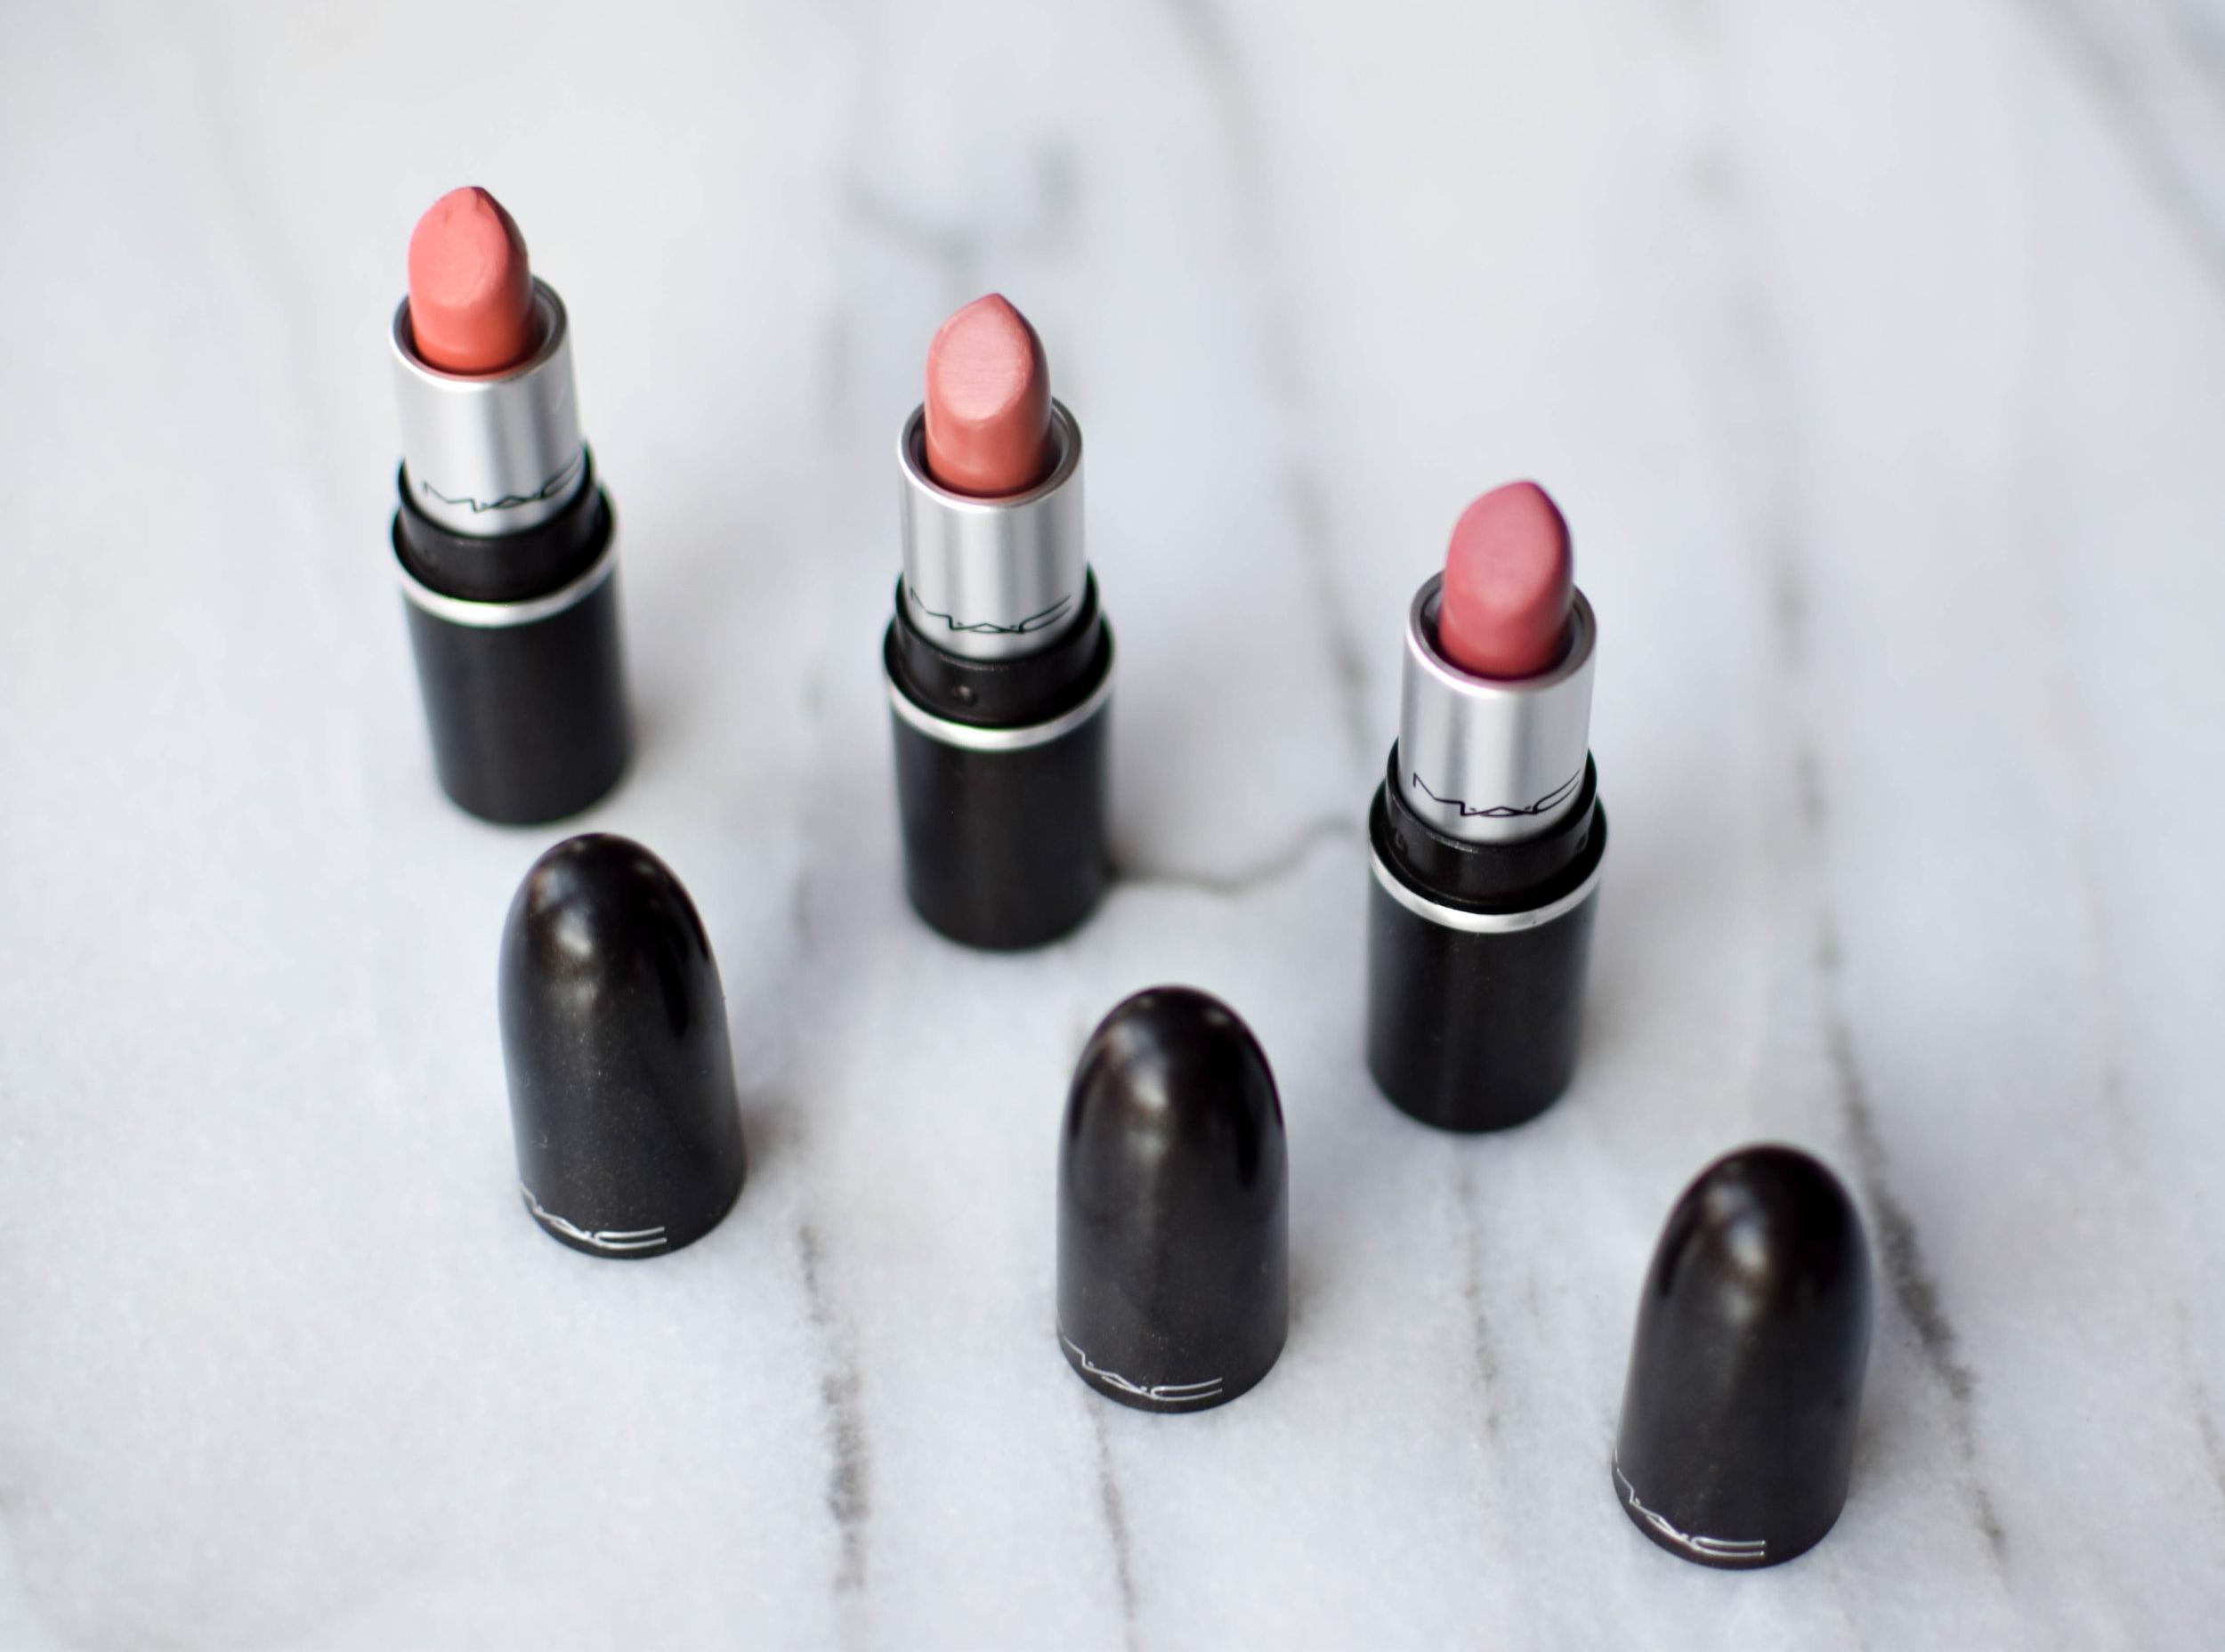 2017 Holiday Beauty Exclusives | Pine Barren Beauty | MAC Snow Ball Cool Mini Lipstick Kit, MAC lip kit, beauty product flat lay